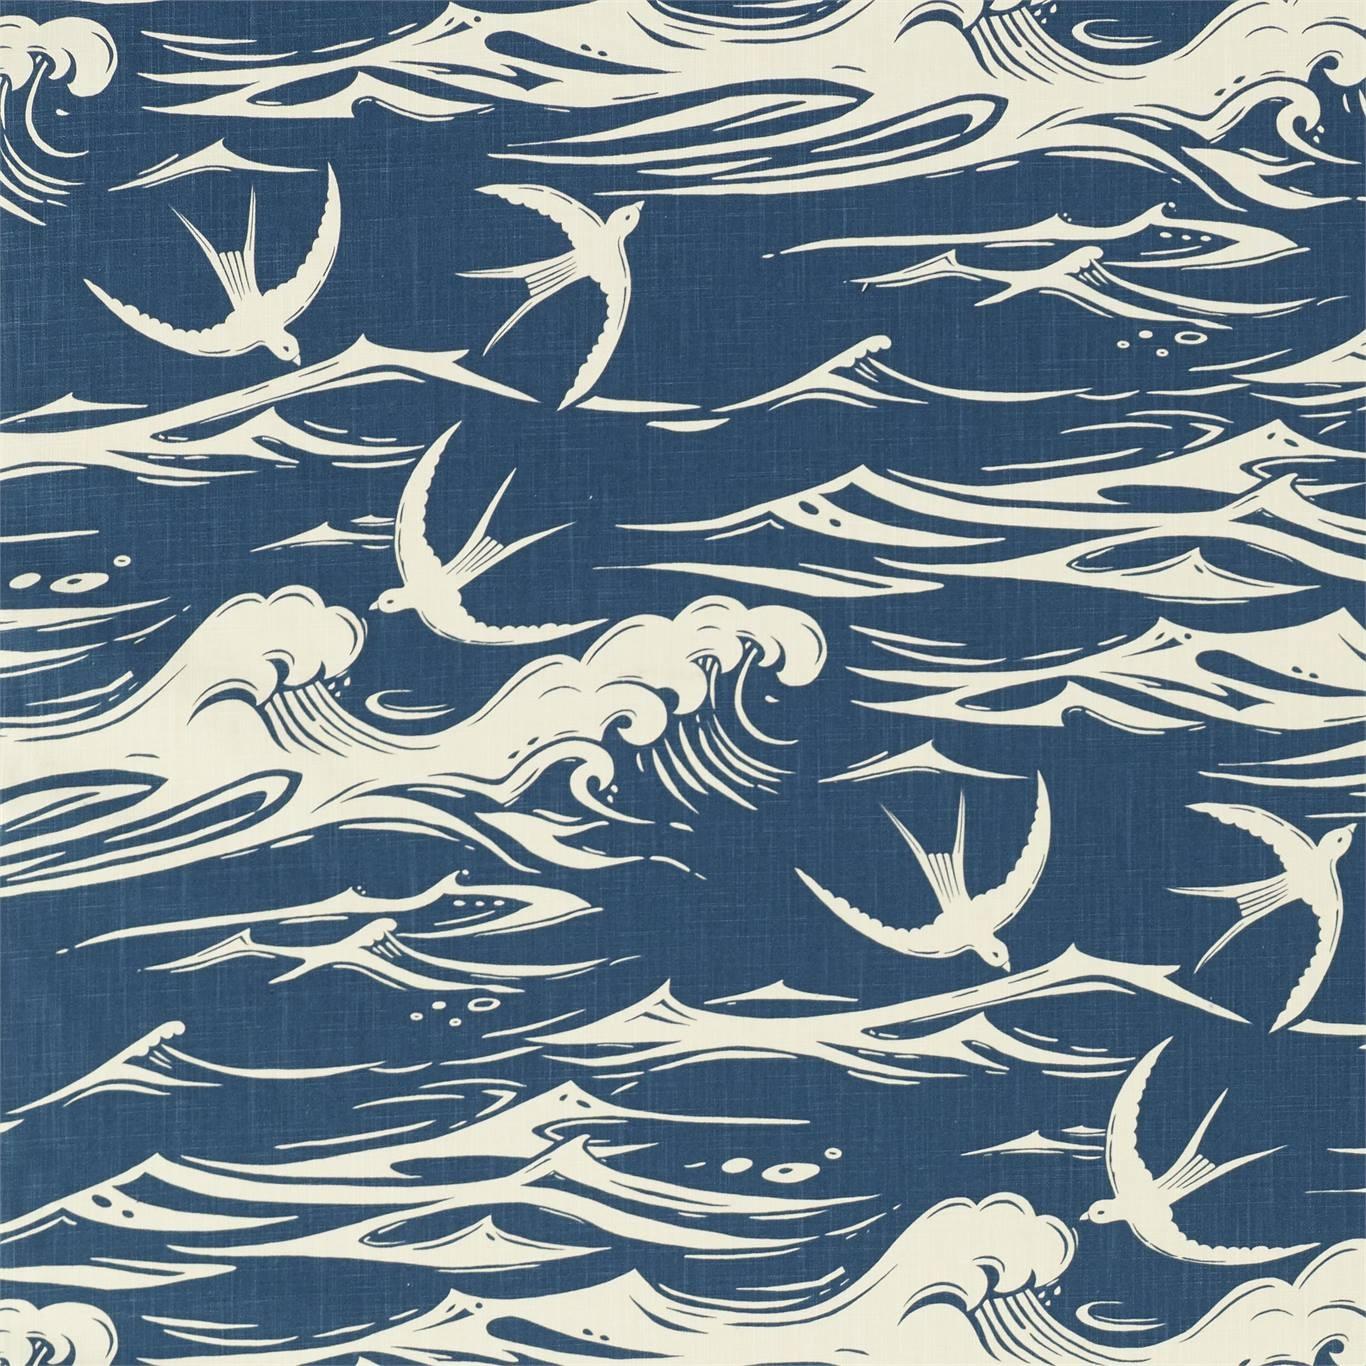 Image of Sanderson Swallows at Sea Navy Fabric 226741